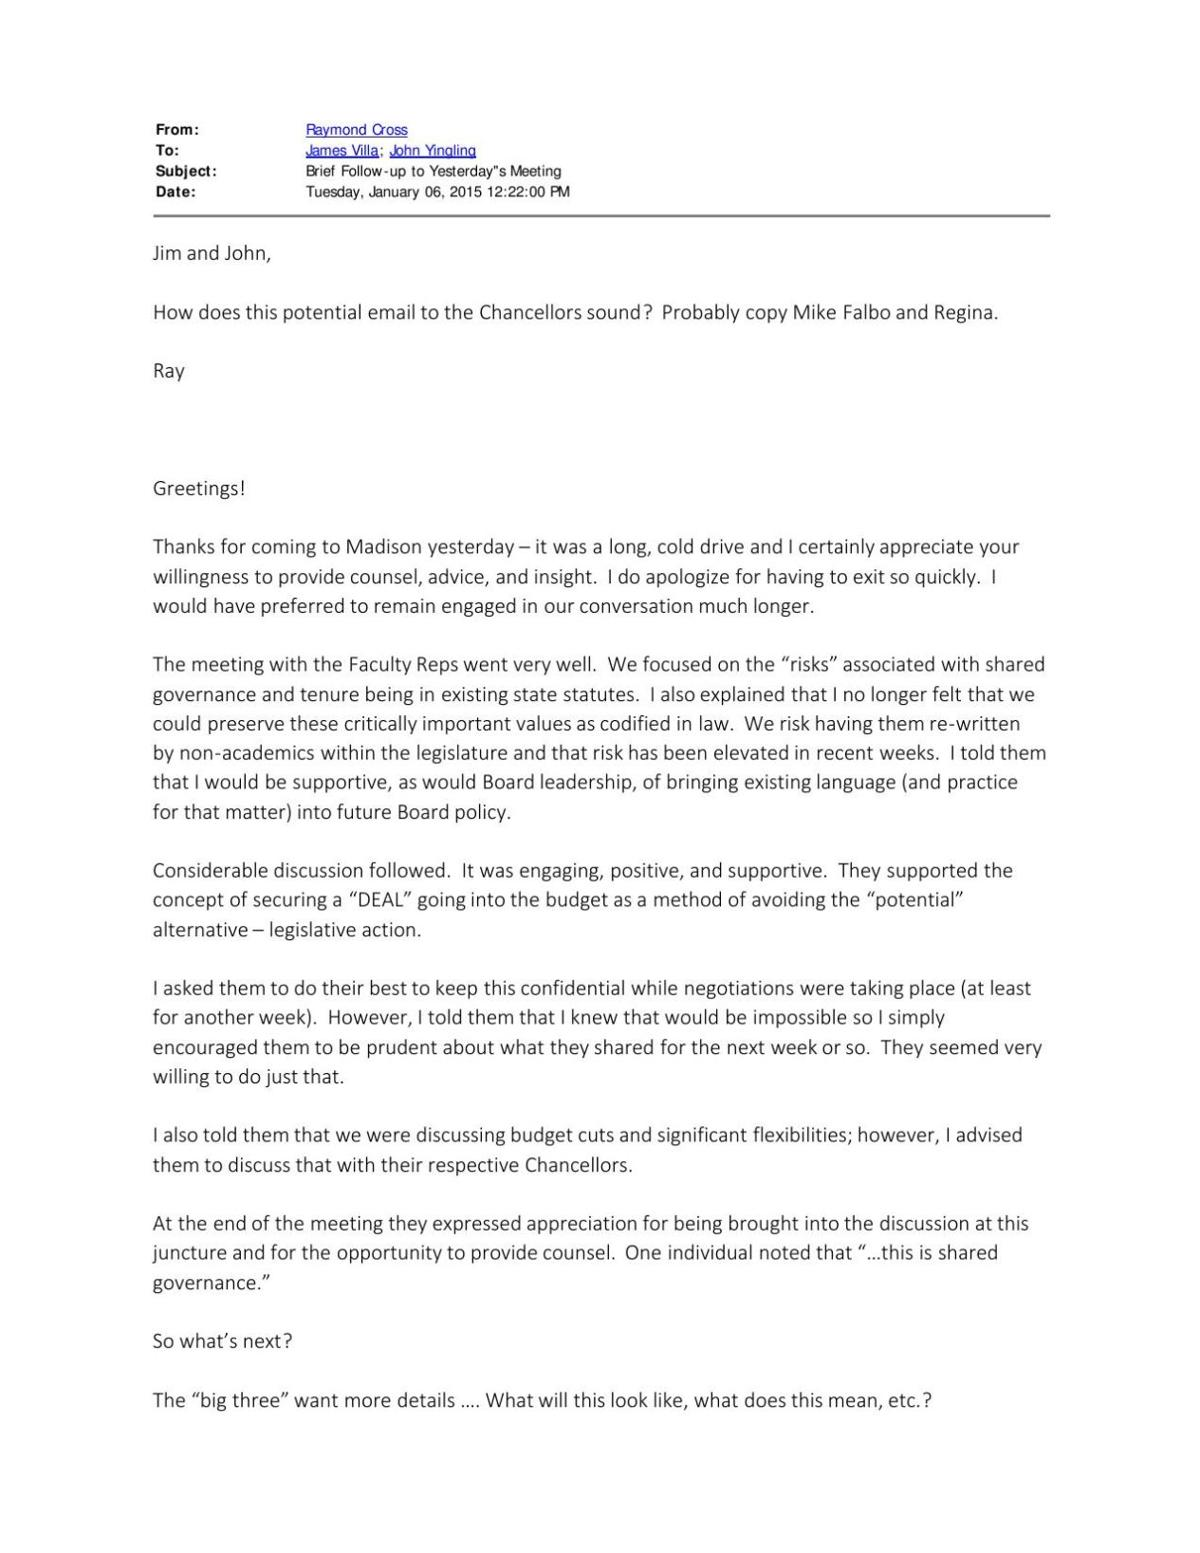 UW System emails regarding budget cuts